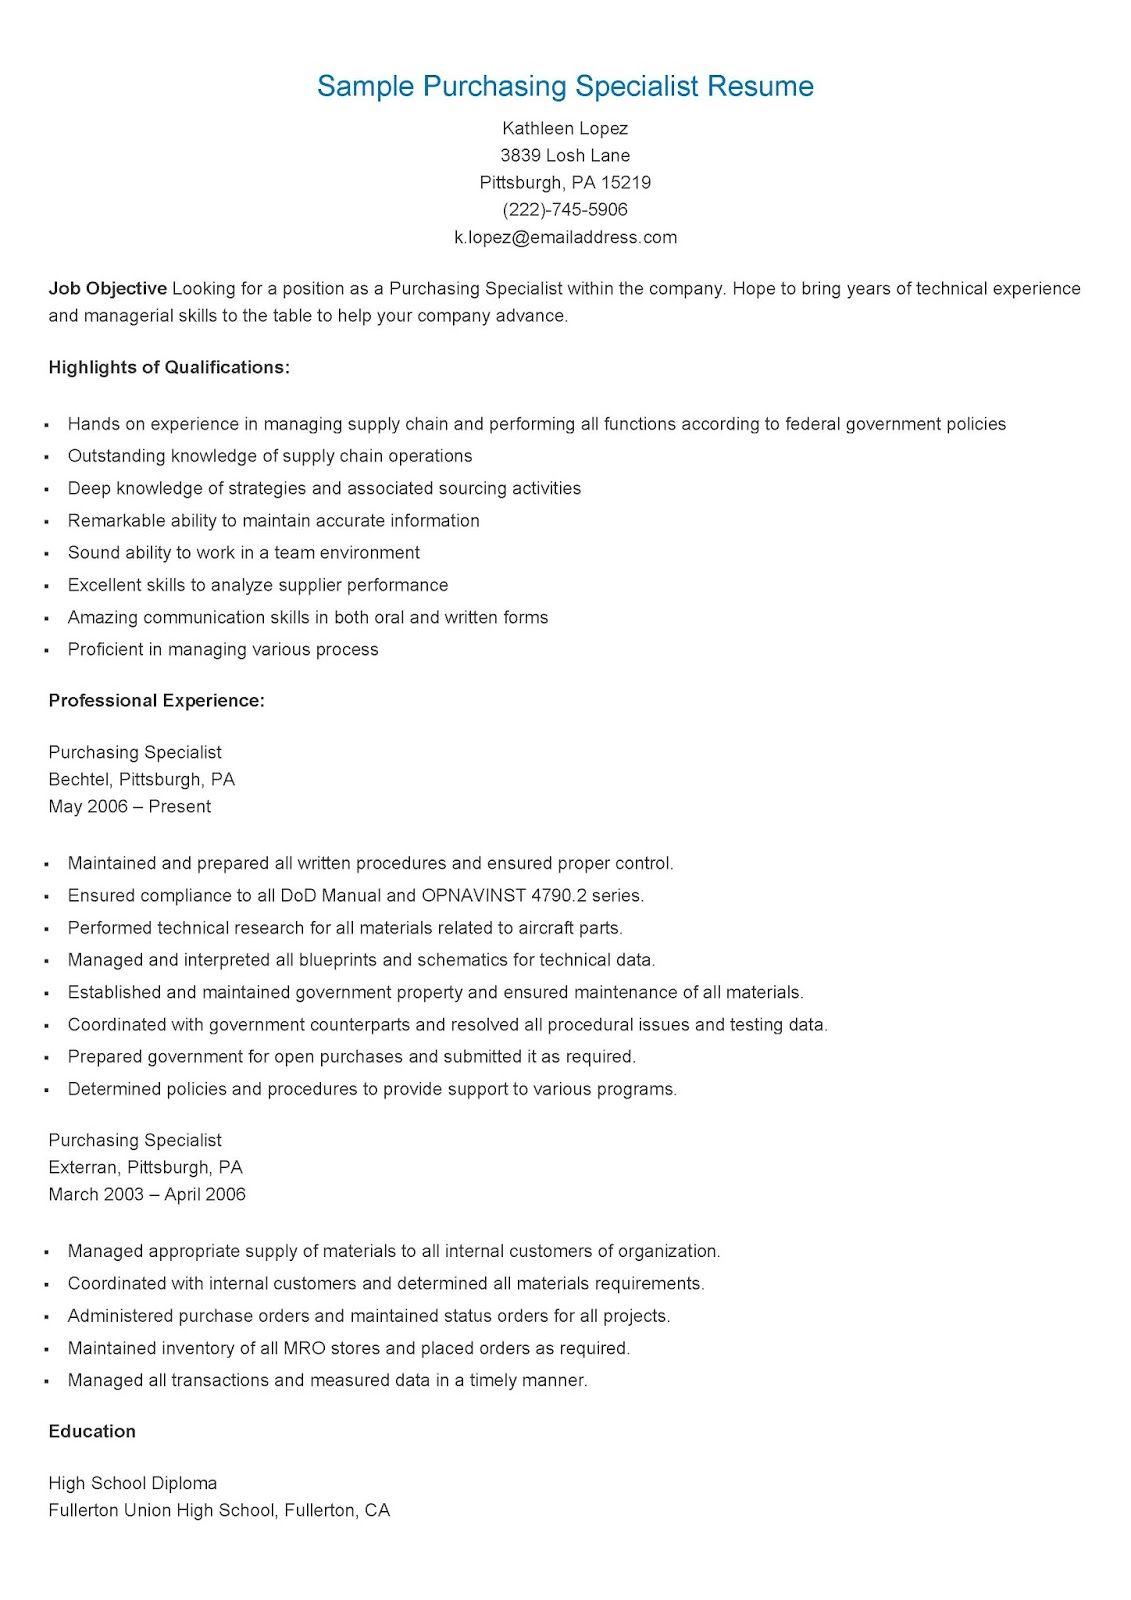 Sample Purchasing Specialist Resume Job Resume Examples Resume Resume Skills